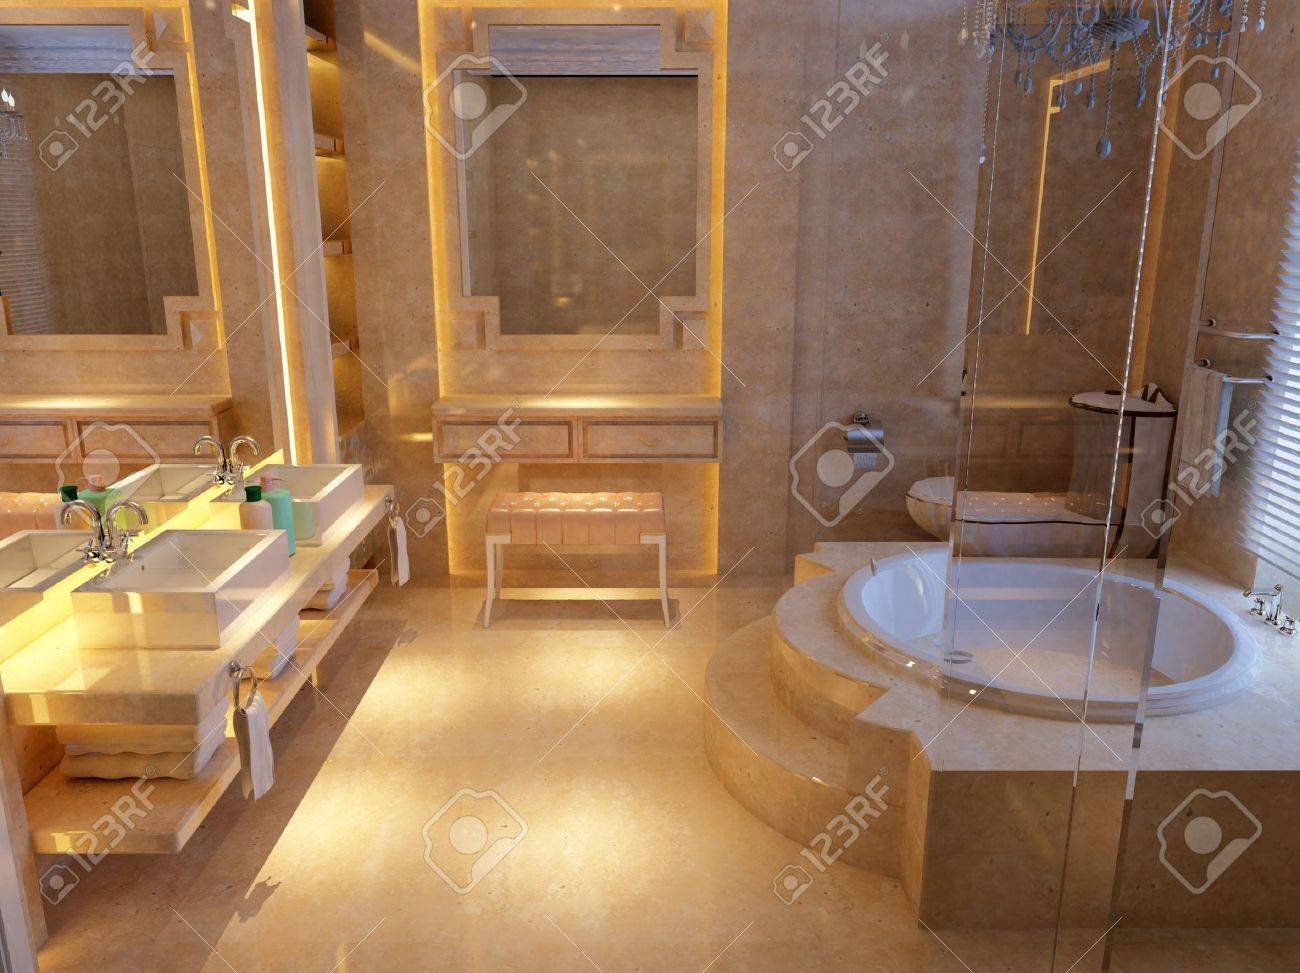 rendering of the modern bathroom interior Stock Photo - 9713180